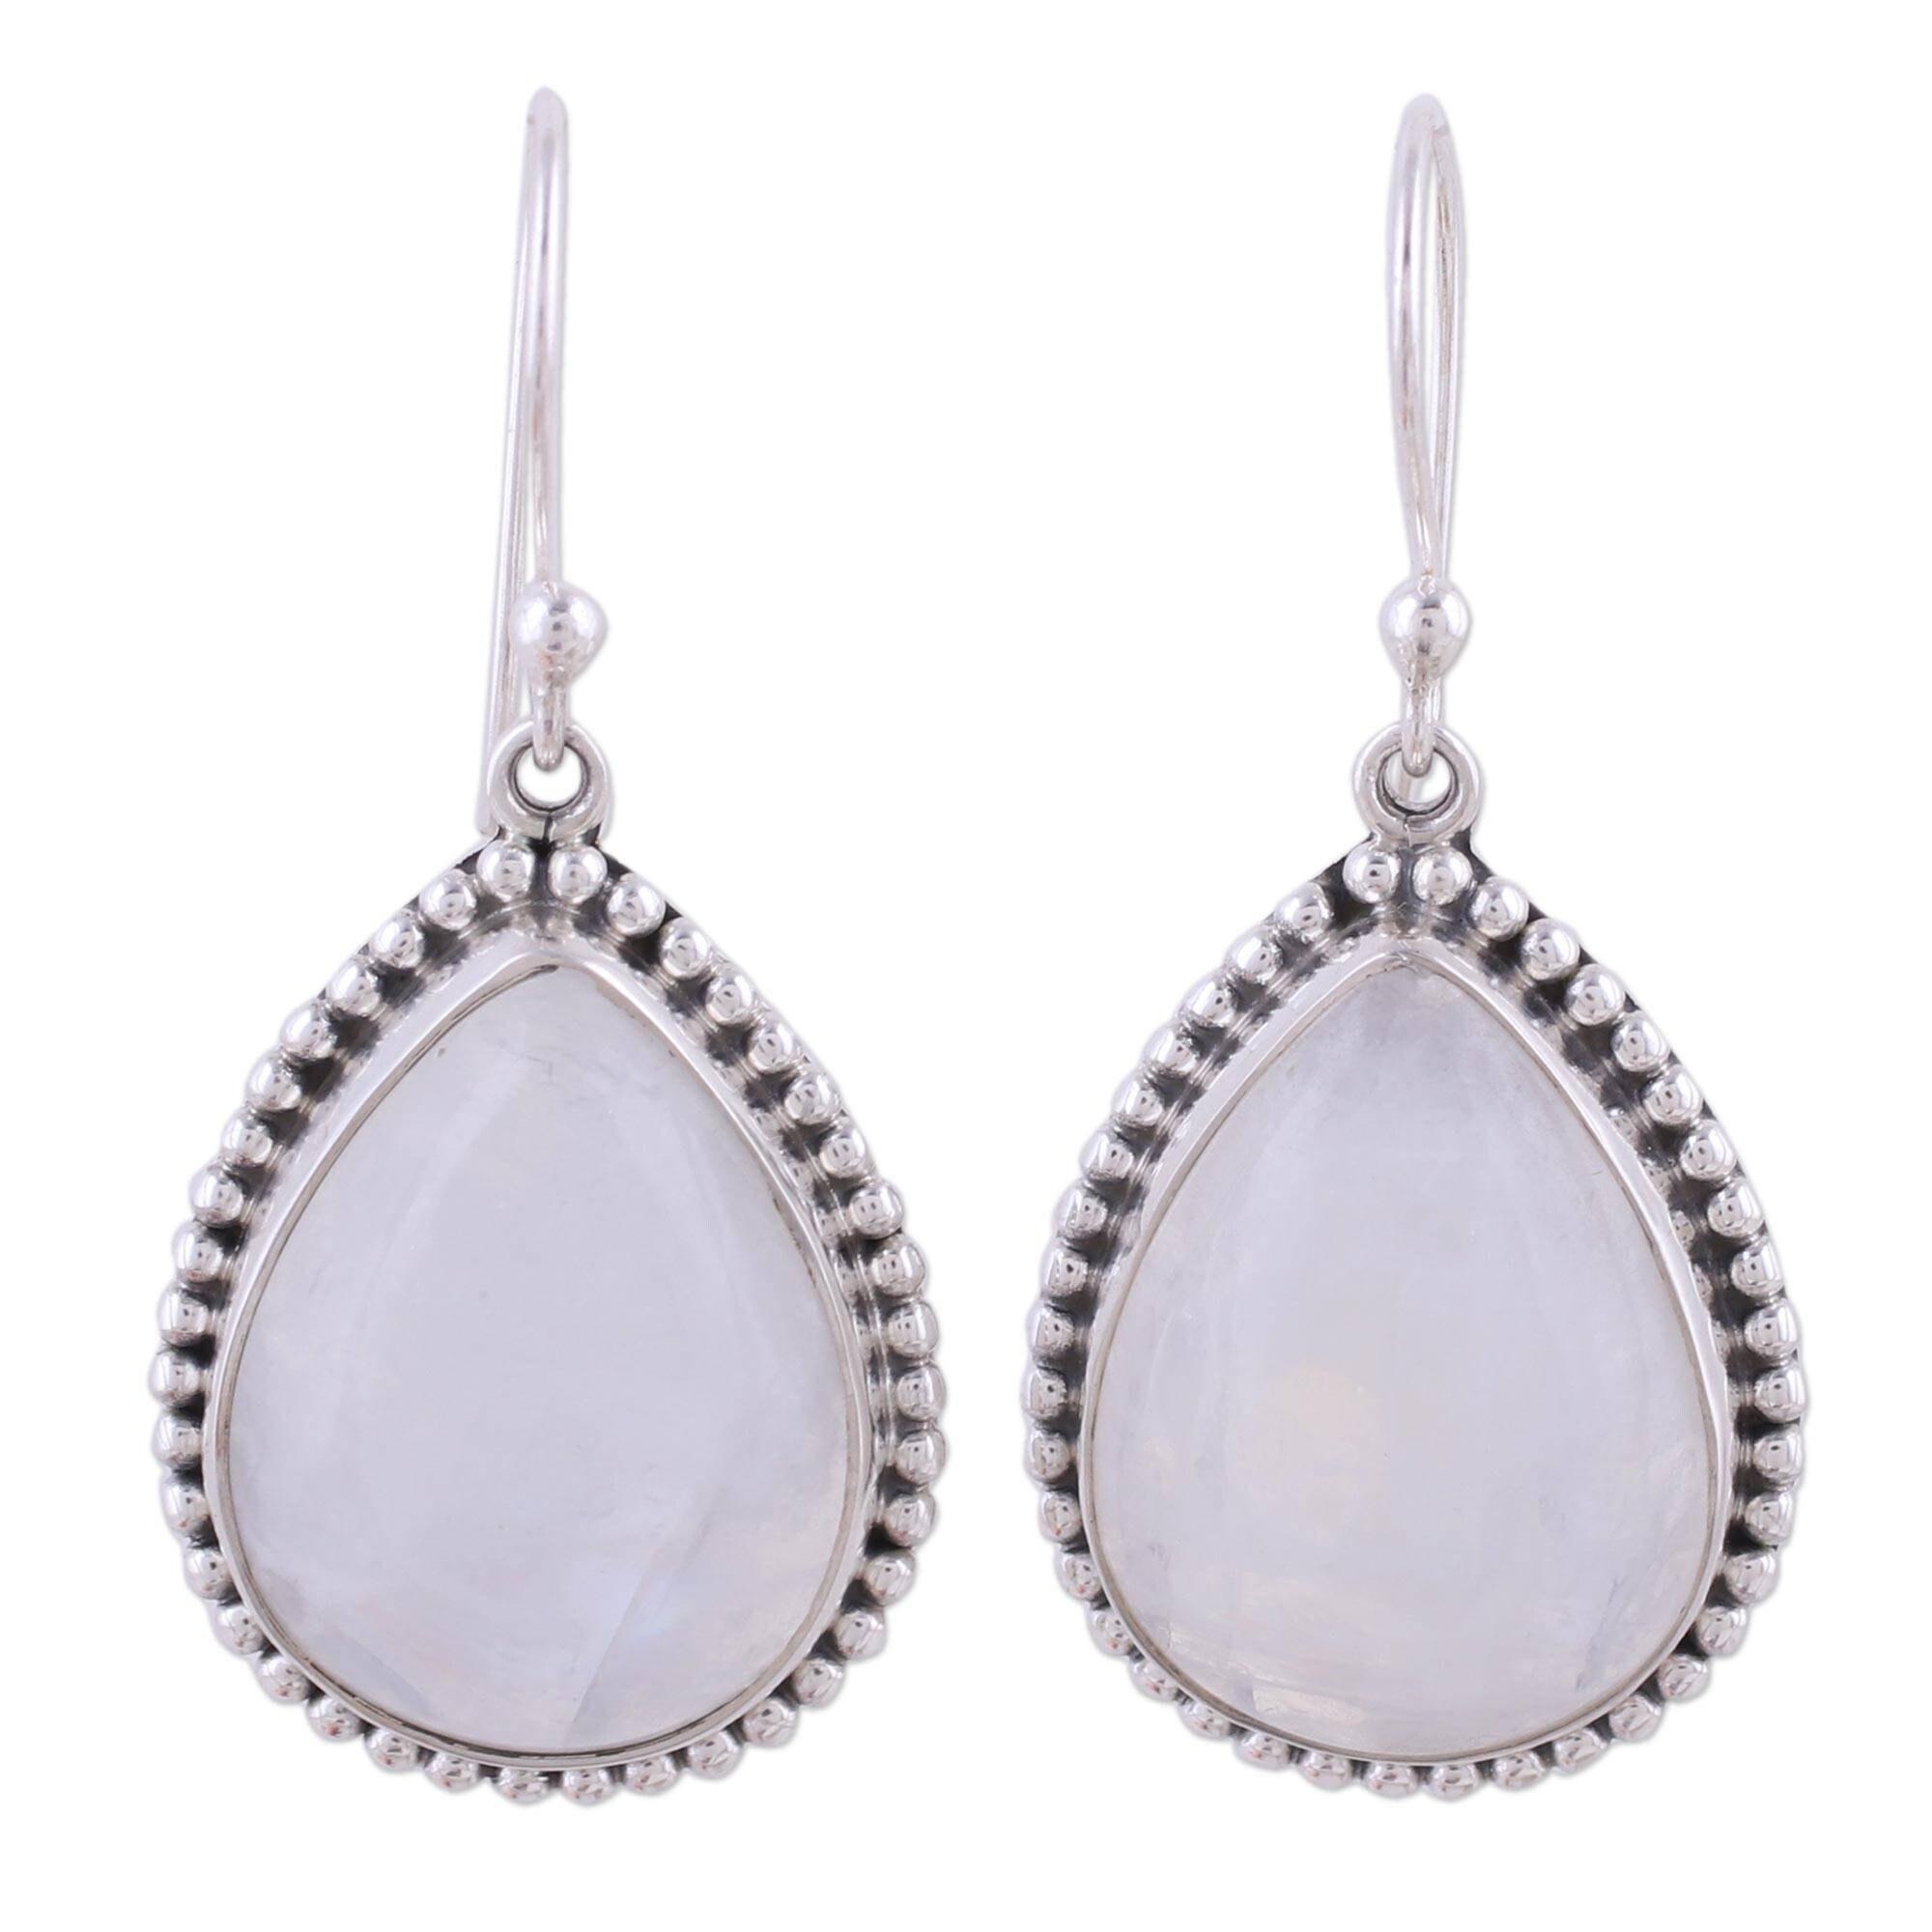 Handmade Sterling Silver Mystical Charm Rainbow Moonstone Earrings India